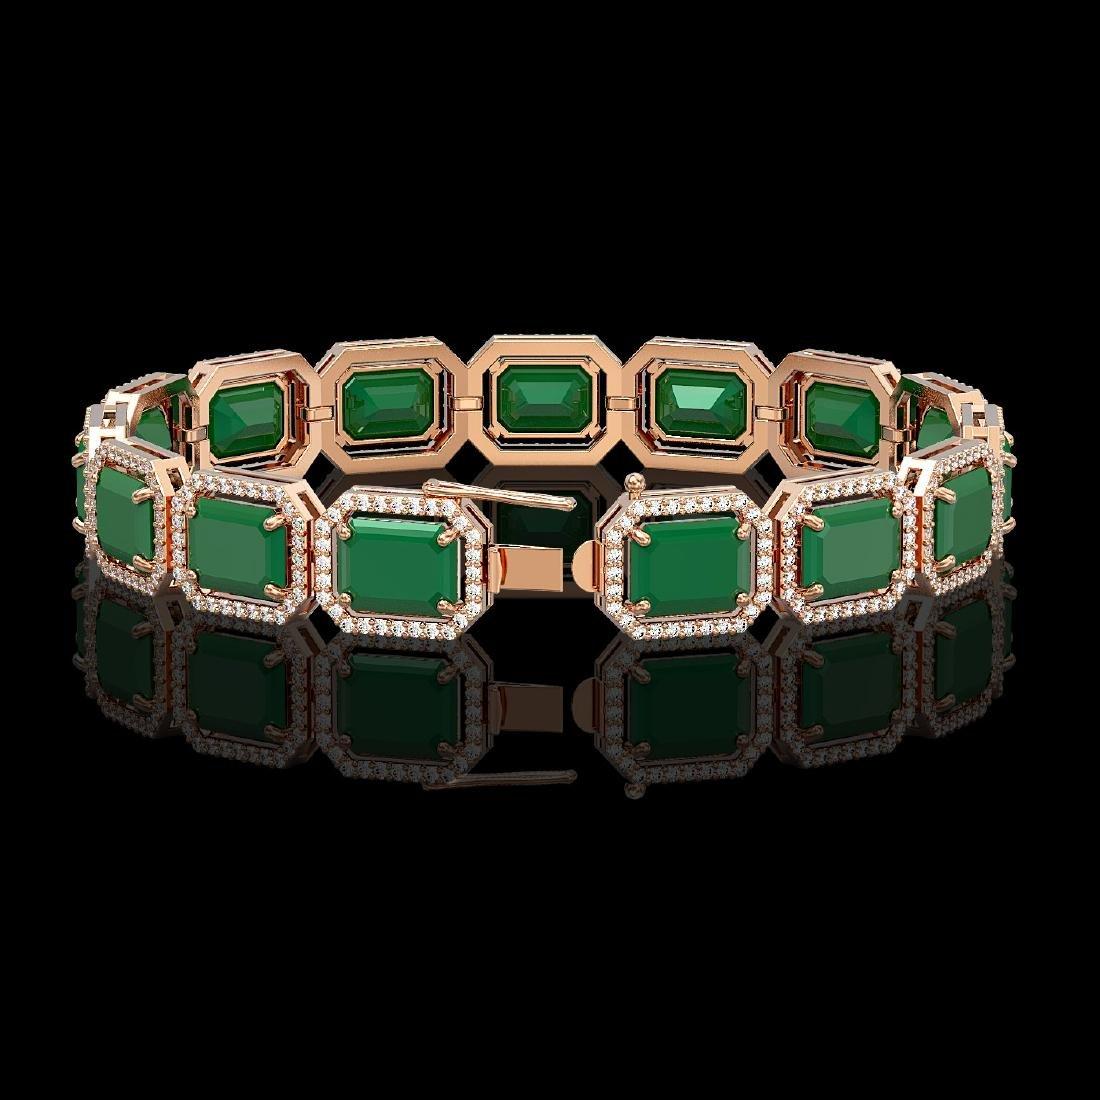 38.61 CTW Emerald & Diamond Halo Bracelet 10K Rose Gold - 2